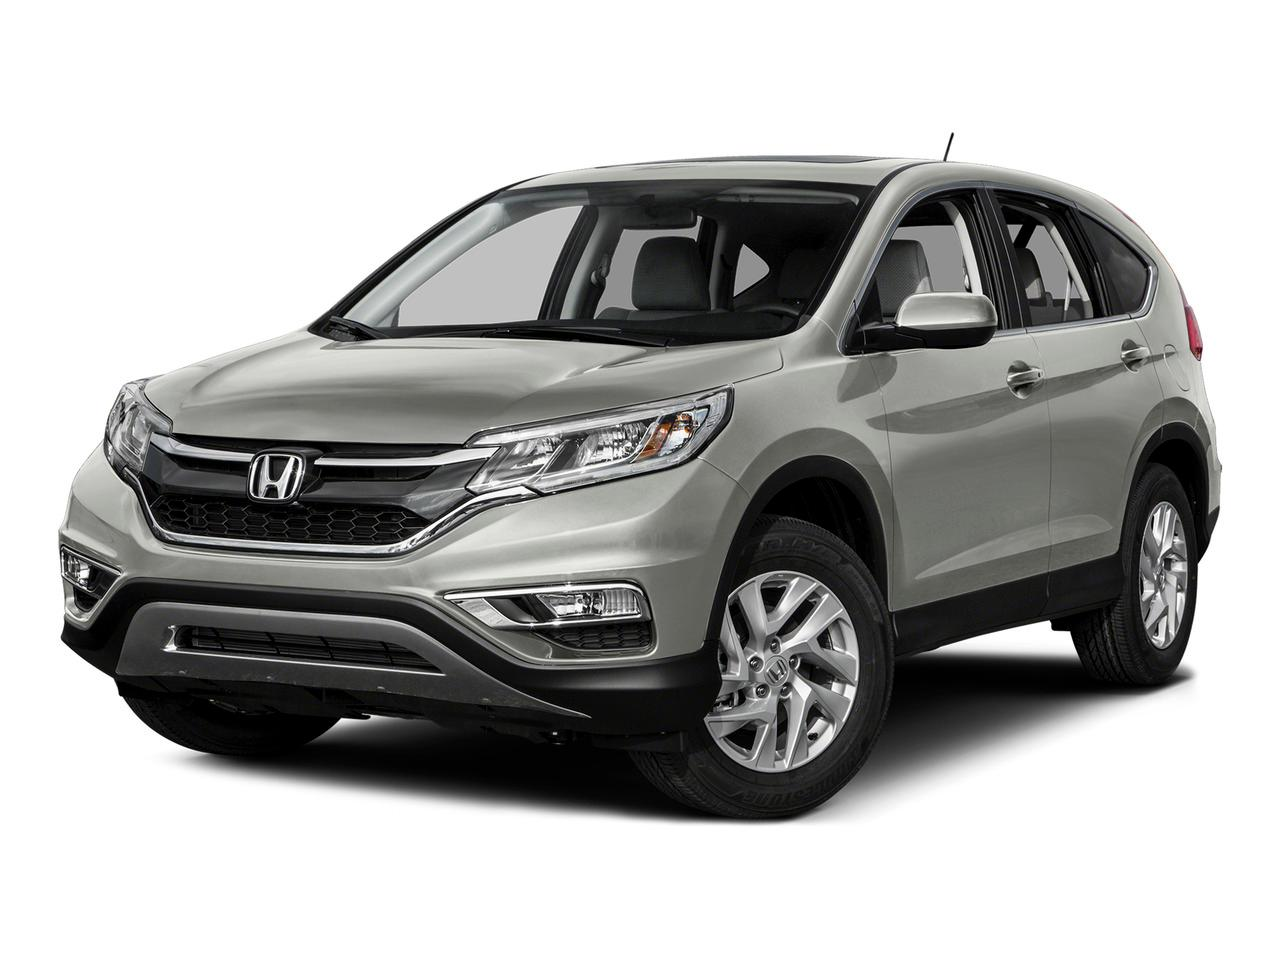 2015 Honda CR-V Vehicle Photo in San Antonio, TX 78230